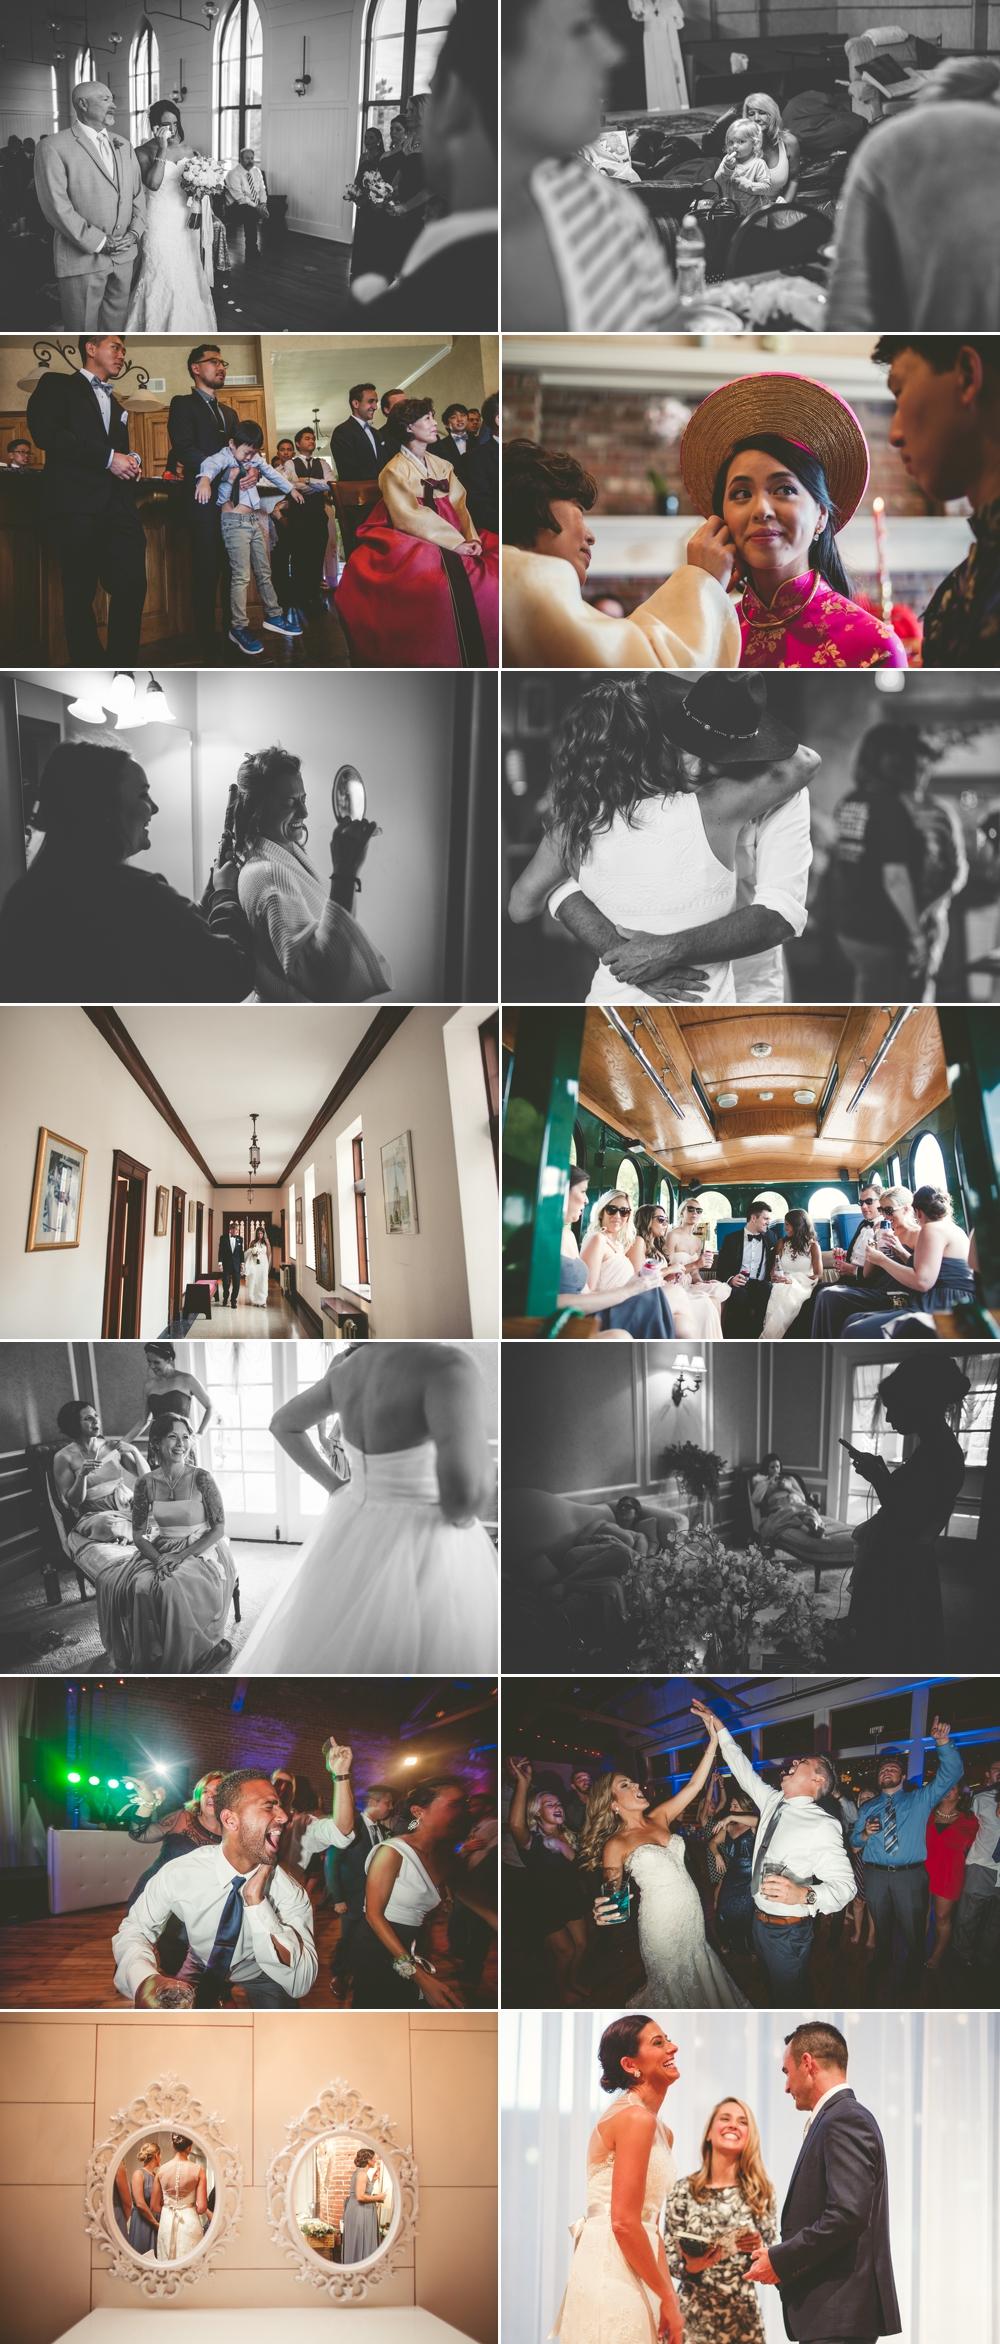 jason_domingues_photography_best_kansas_city_photography_kc_wedding_weddings0009.jpg